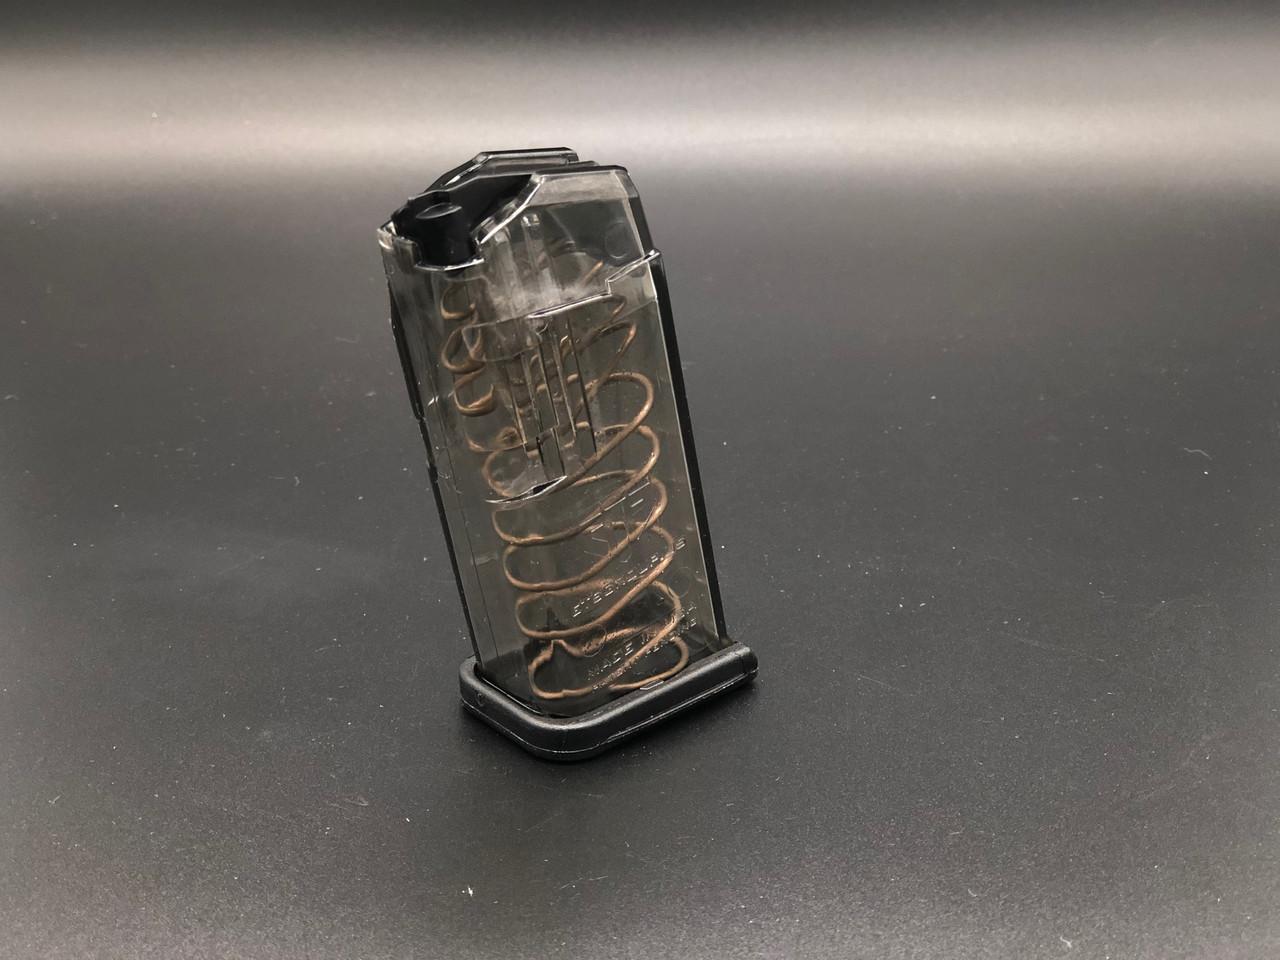 Elite Tactical System (ETS) Glock G43 7rnd 9mm Clear Polymer Finish